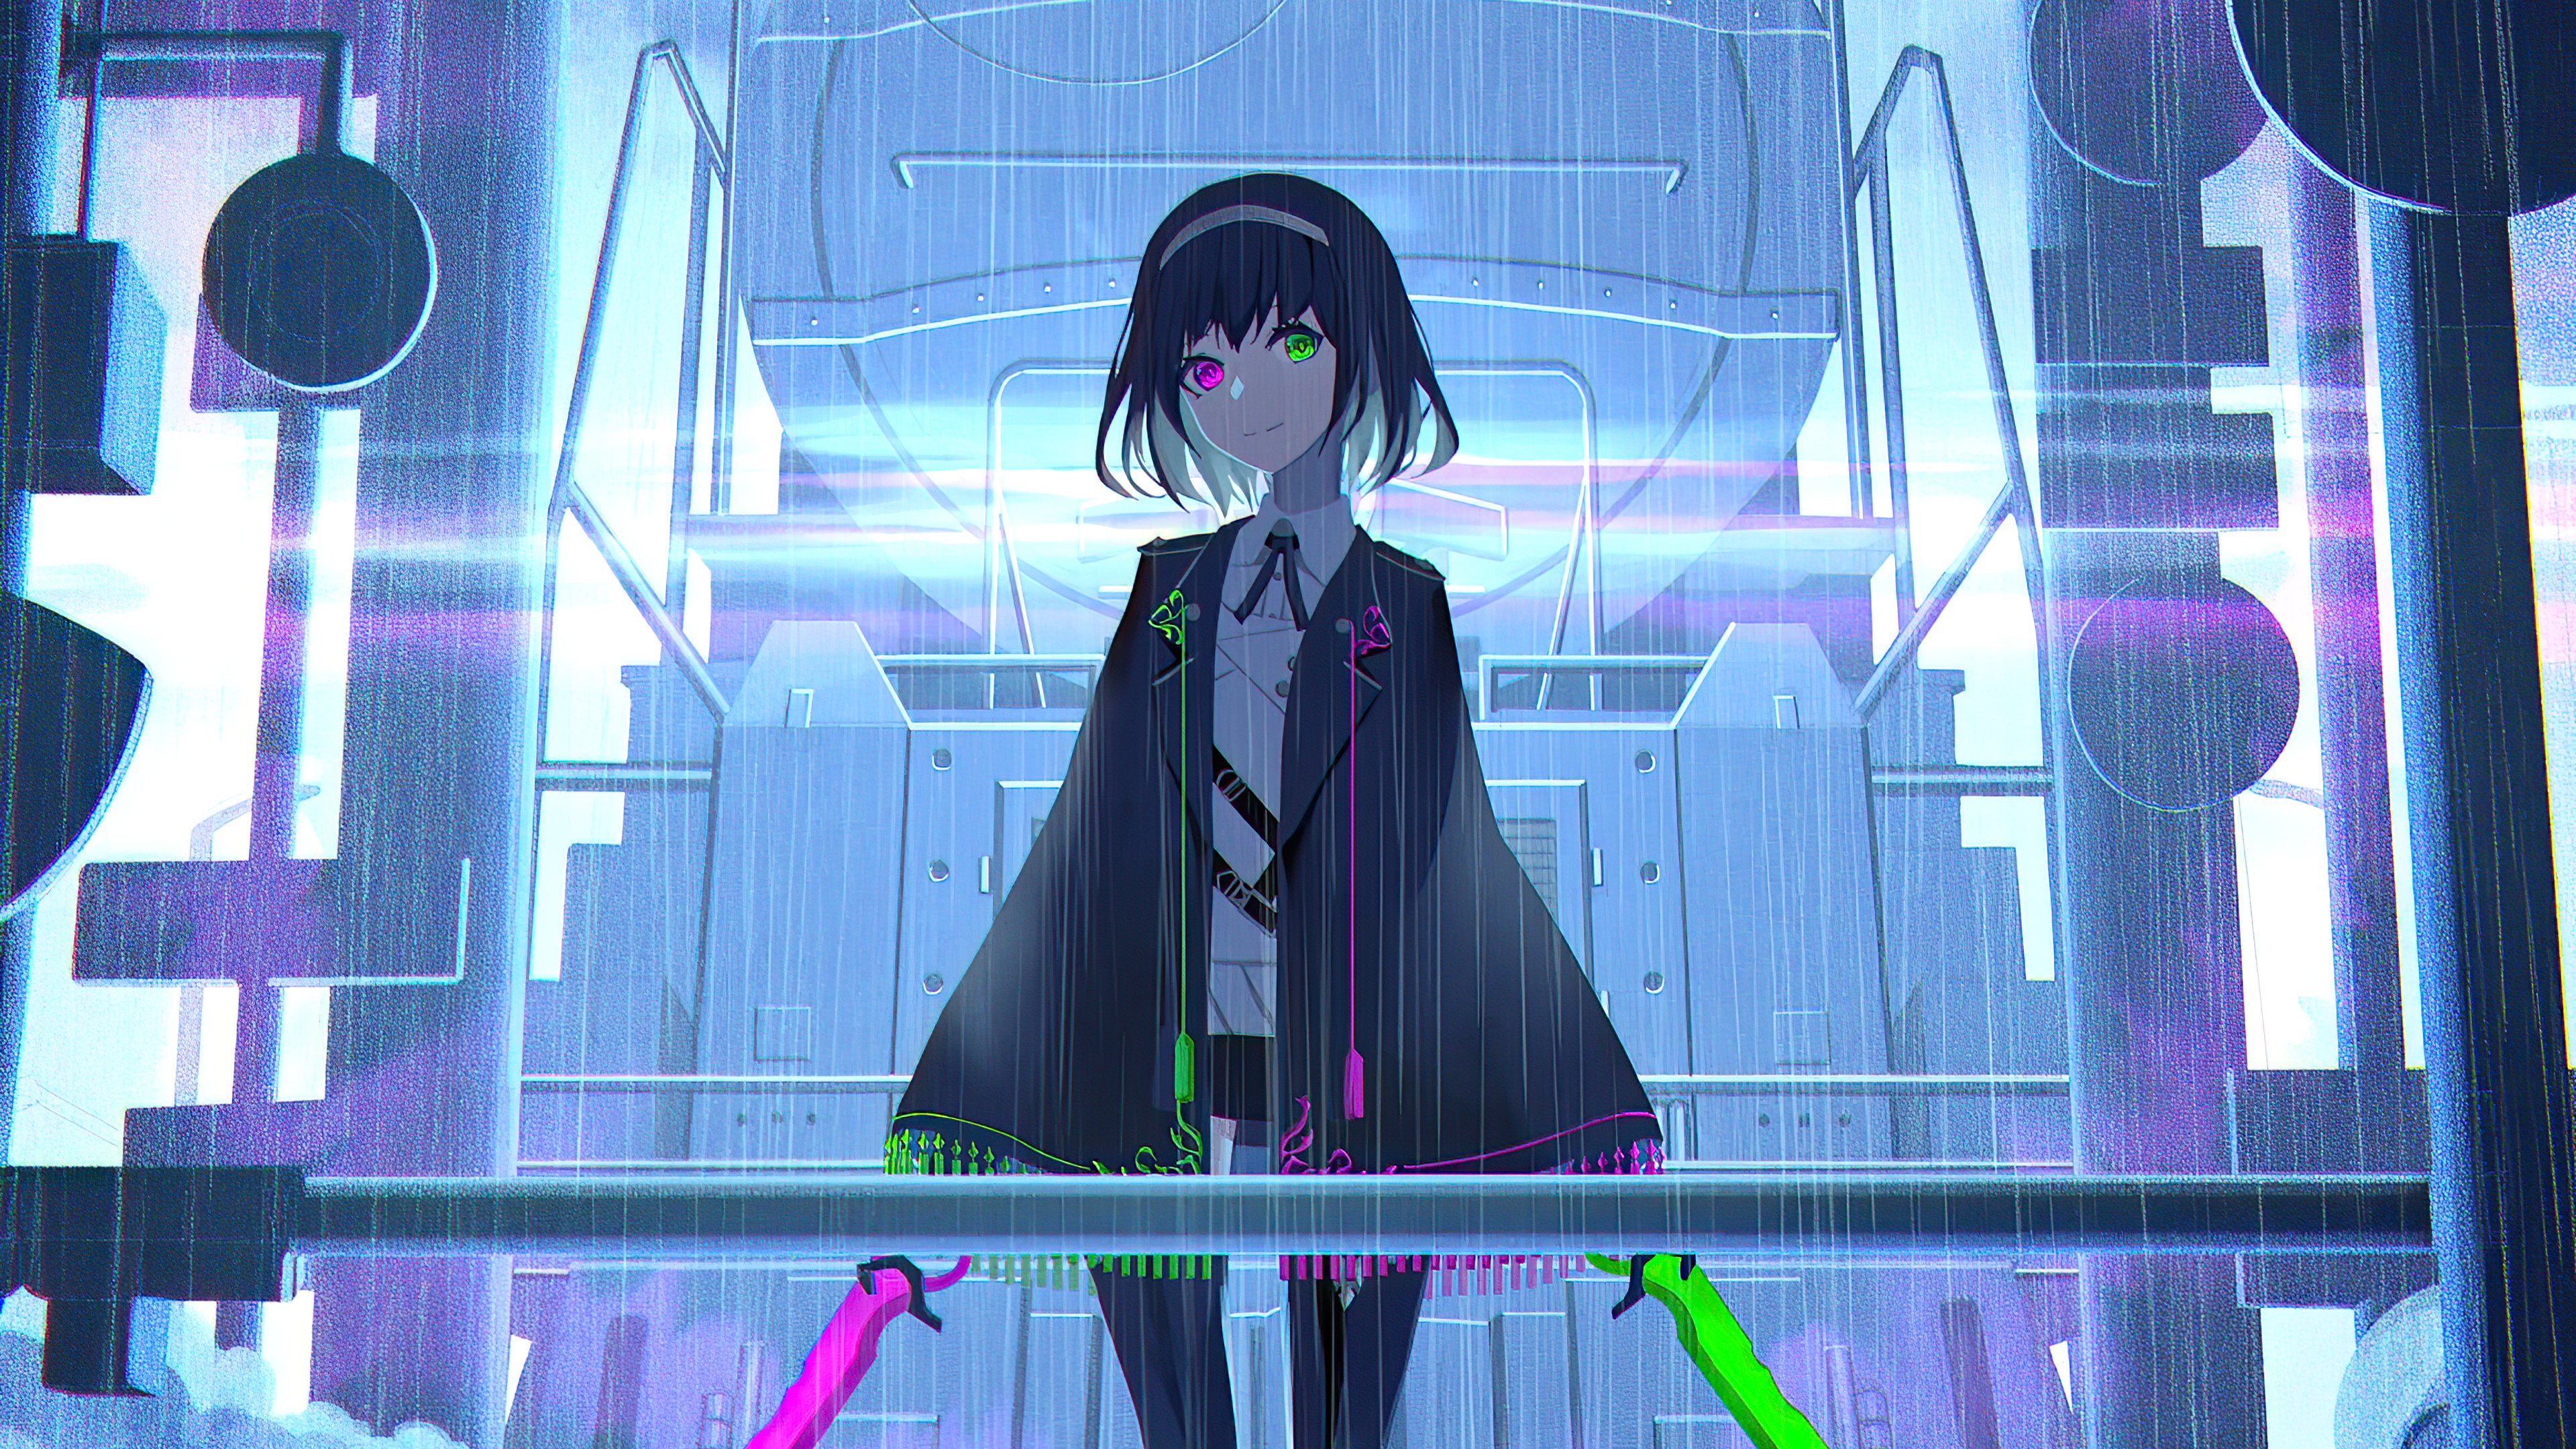 anime girl with two swords 4k 1602436340 - Anime Girl With Two Swords 4k - Anime Girl With Two Swords 4k wallpapers